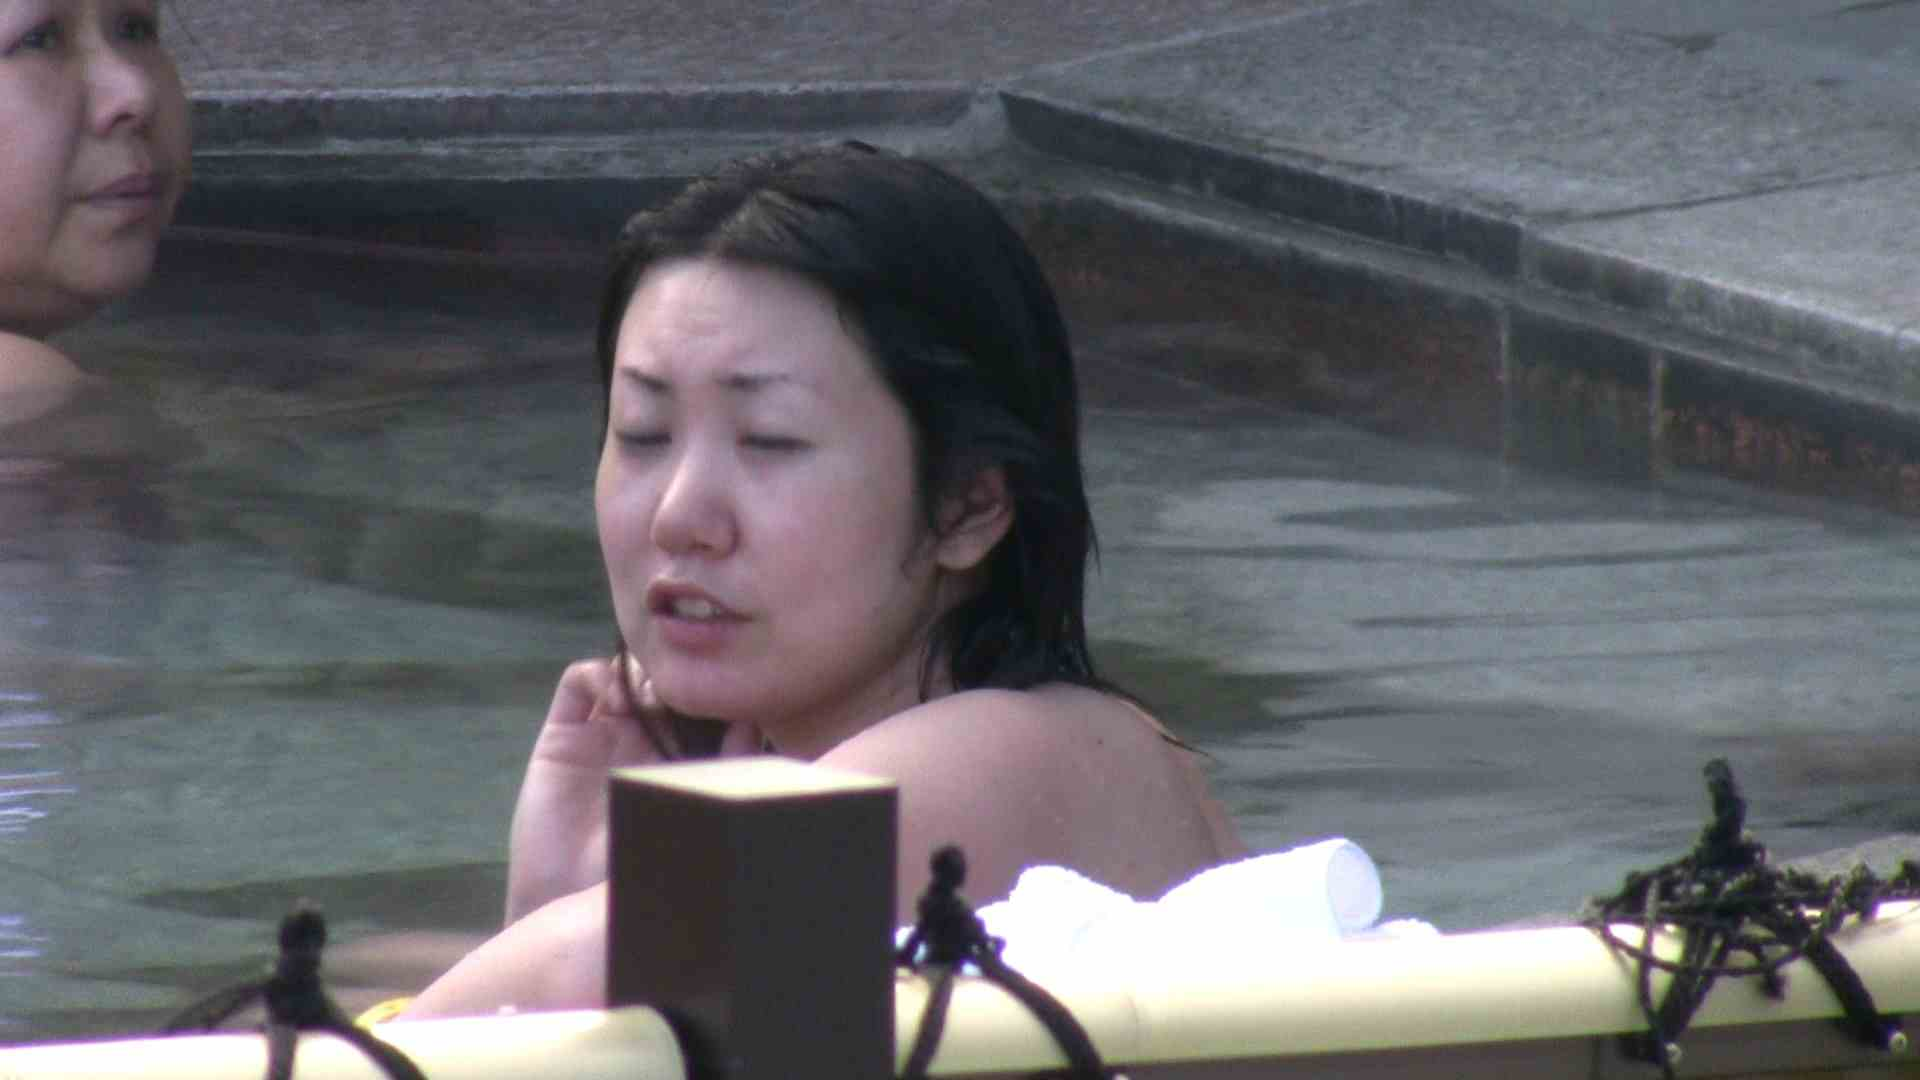 Aquaな露天風呂Vol.117 盗撮師作品  97pic 72